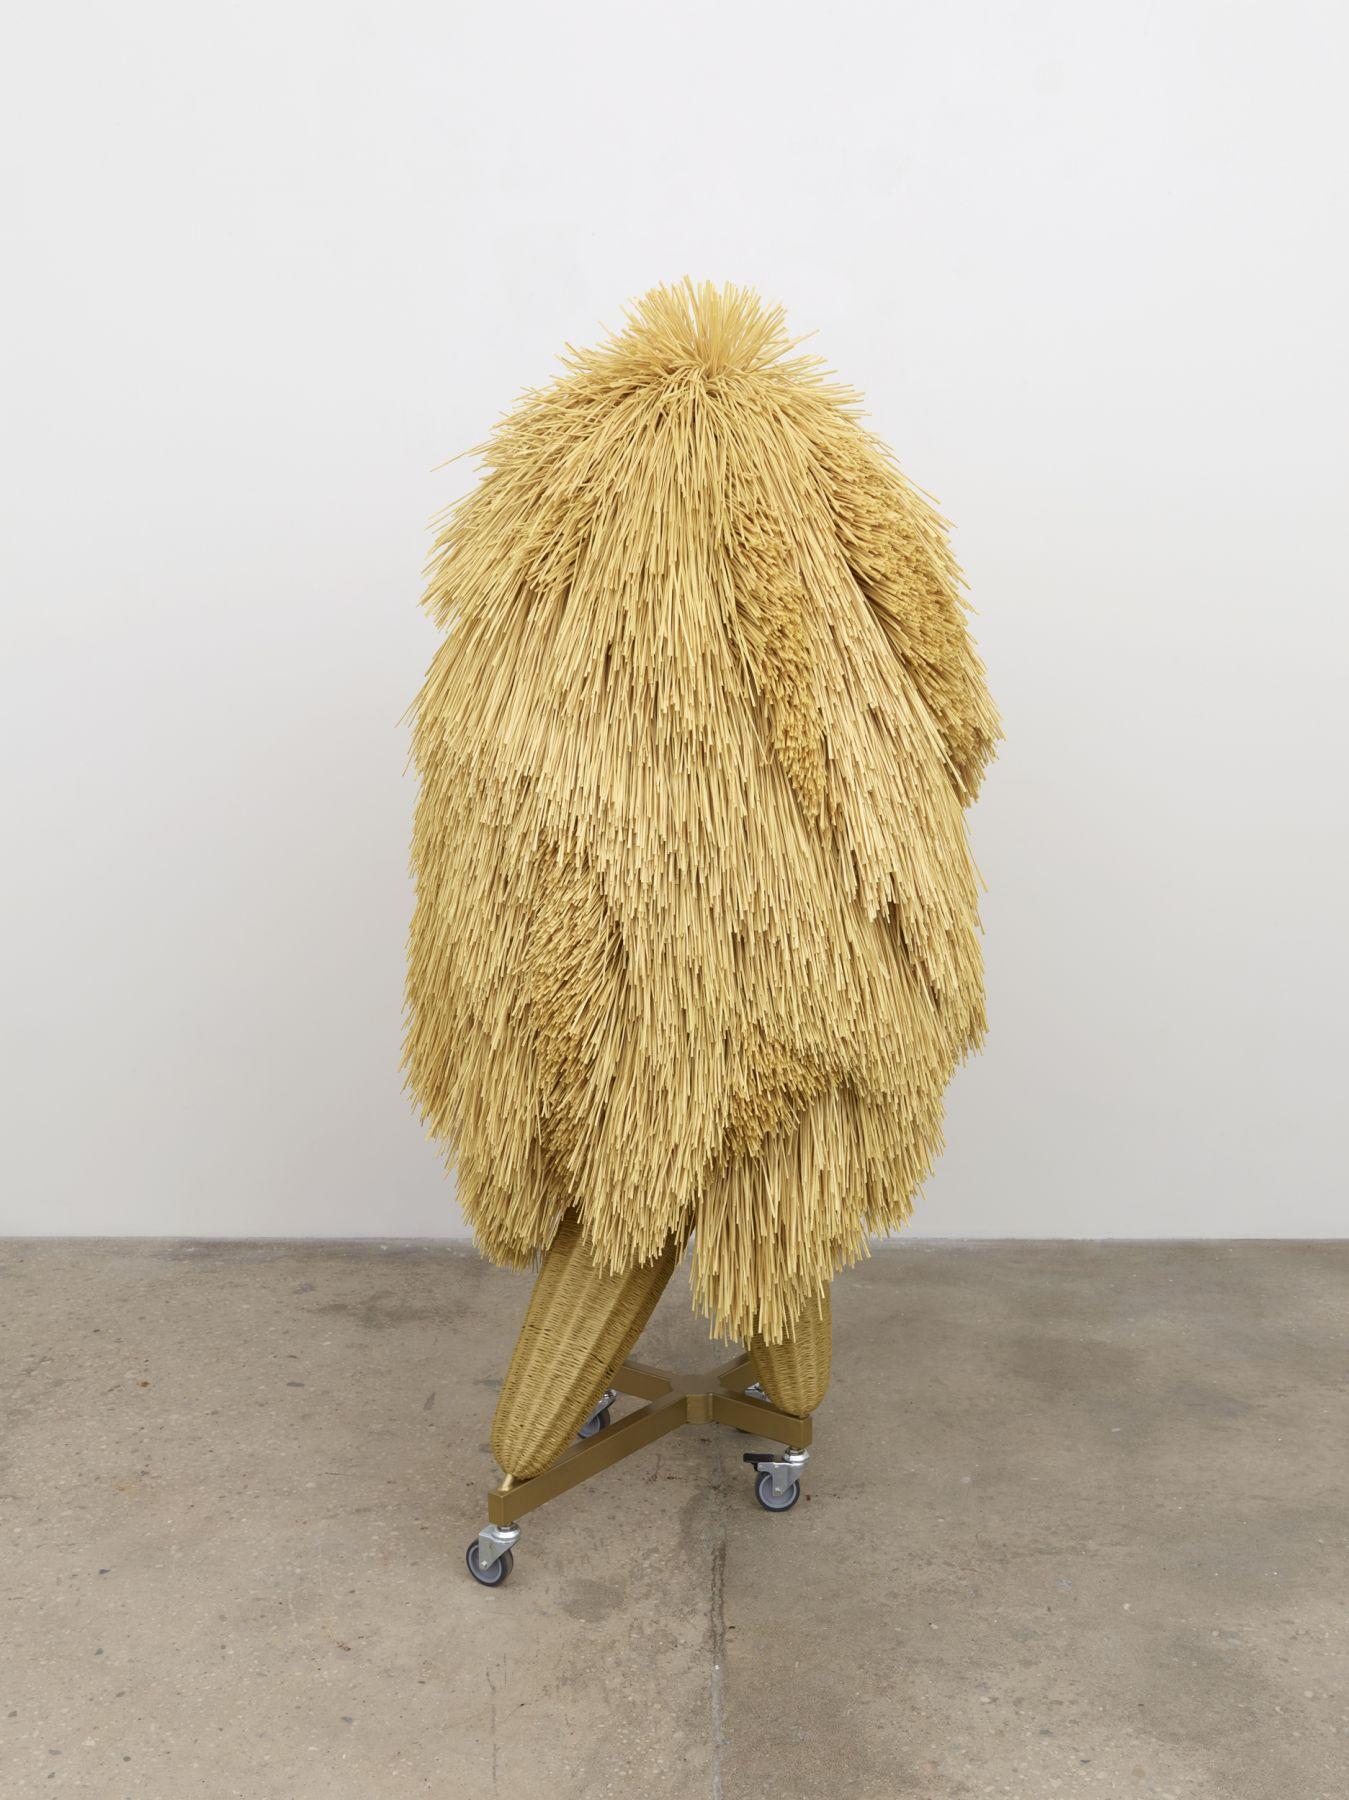 Haegue Yang, The Intermediate – Asymmetric Quadrupedal Bushy-head, 2016